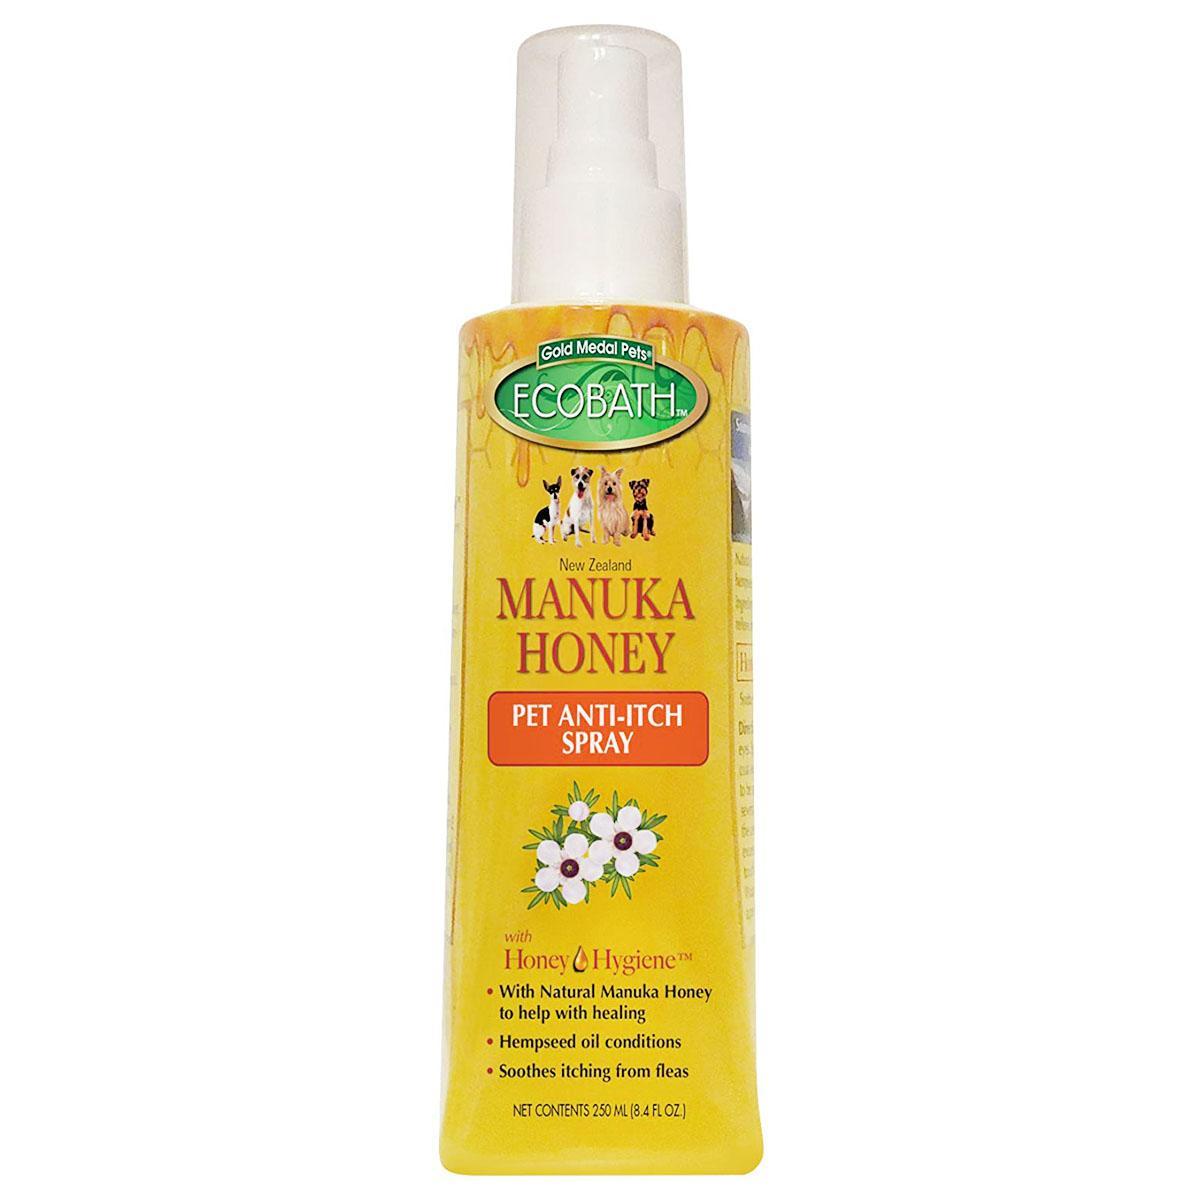 EcoBath Manuka Honey Pet Anti-Itch Spray by Cardinal Pet Care